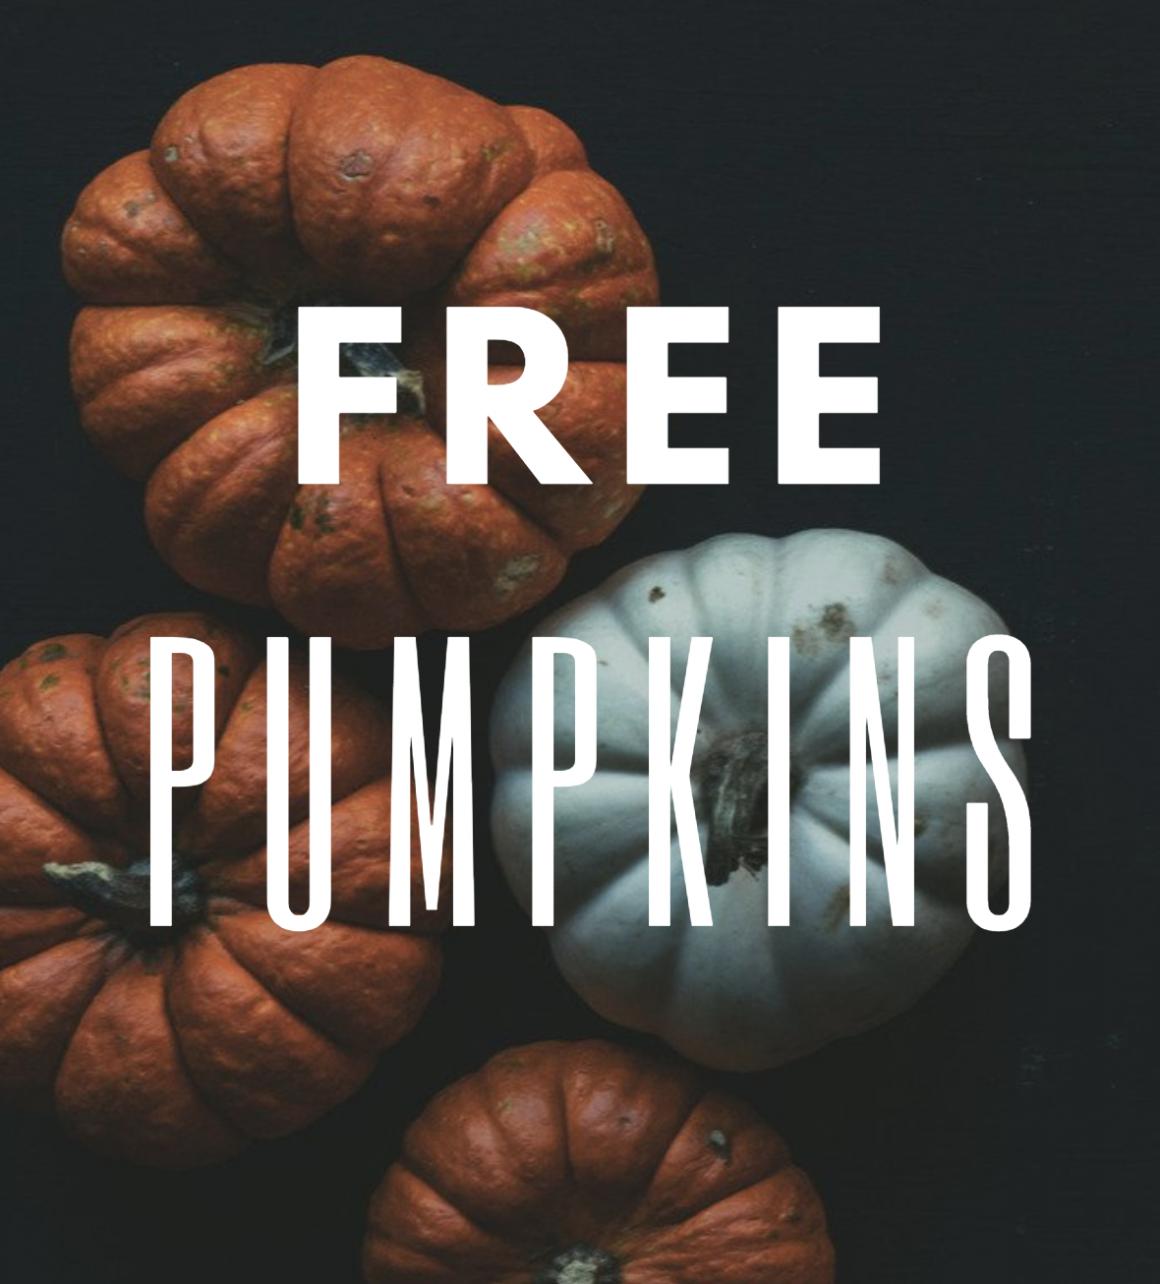 Save money on Pumpkins